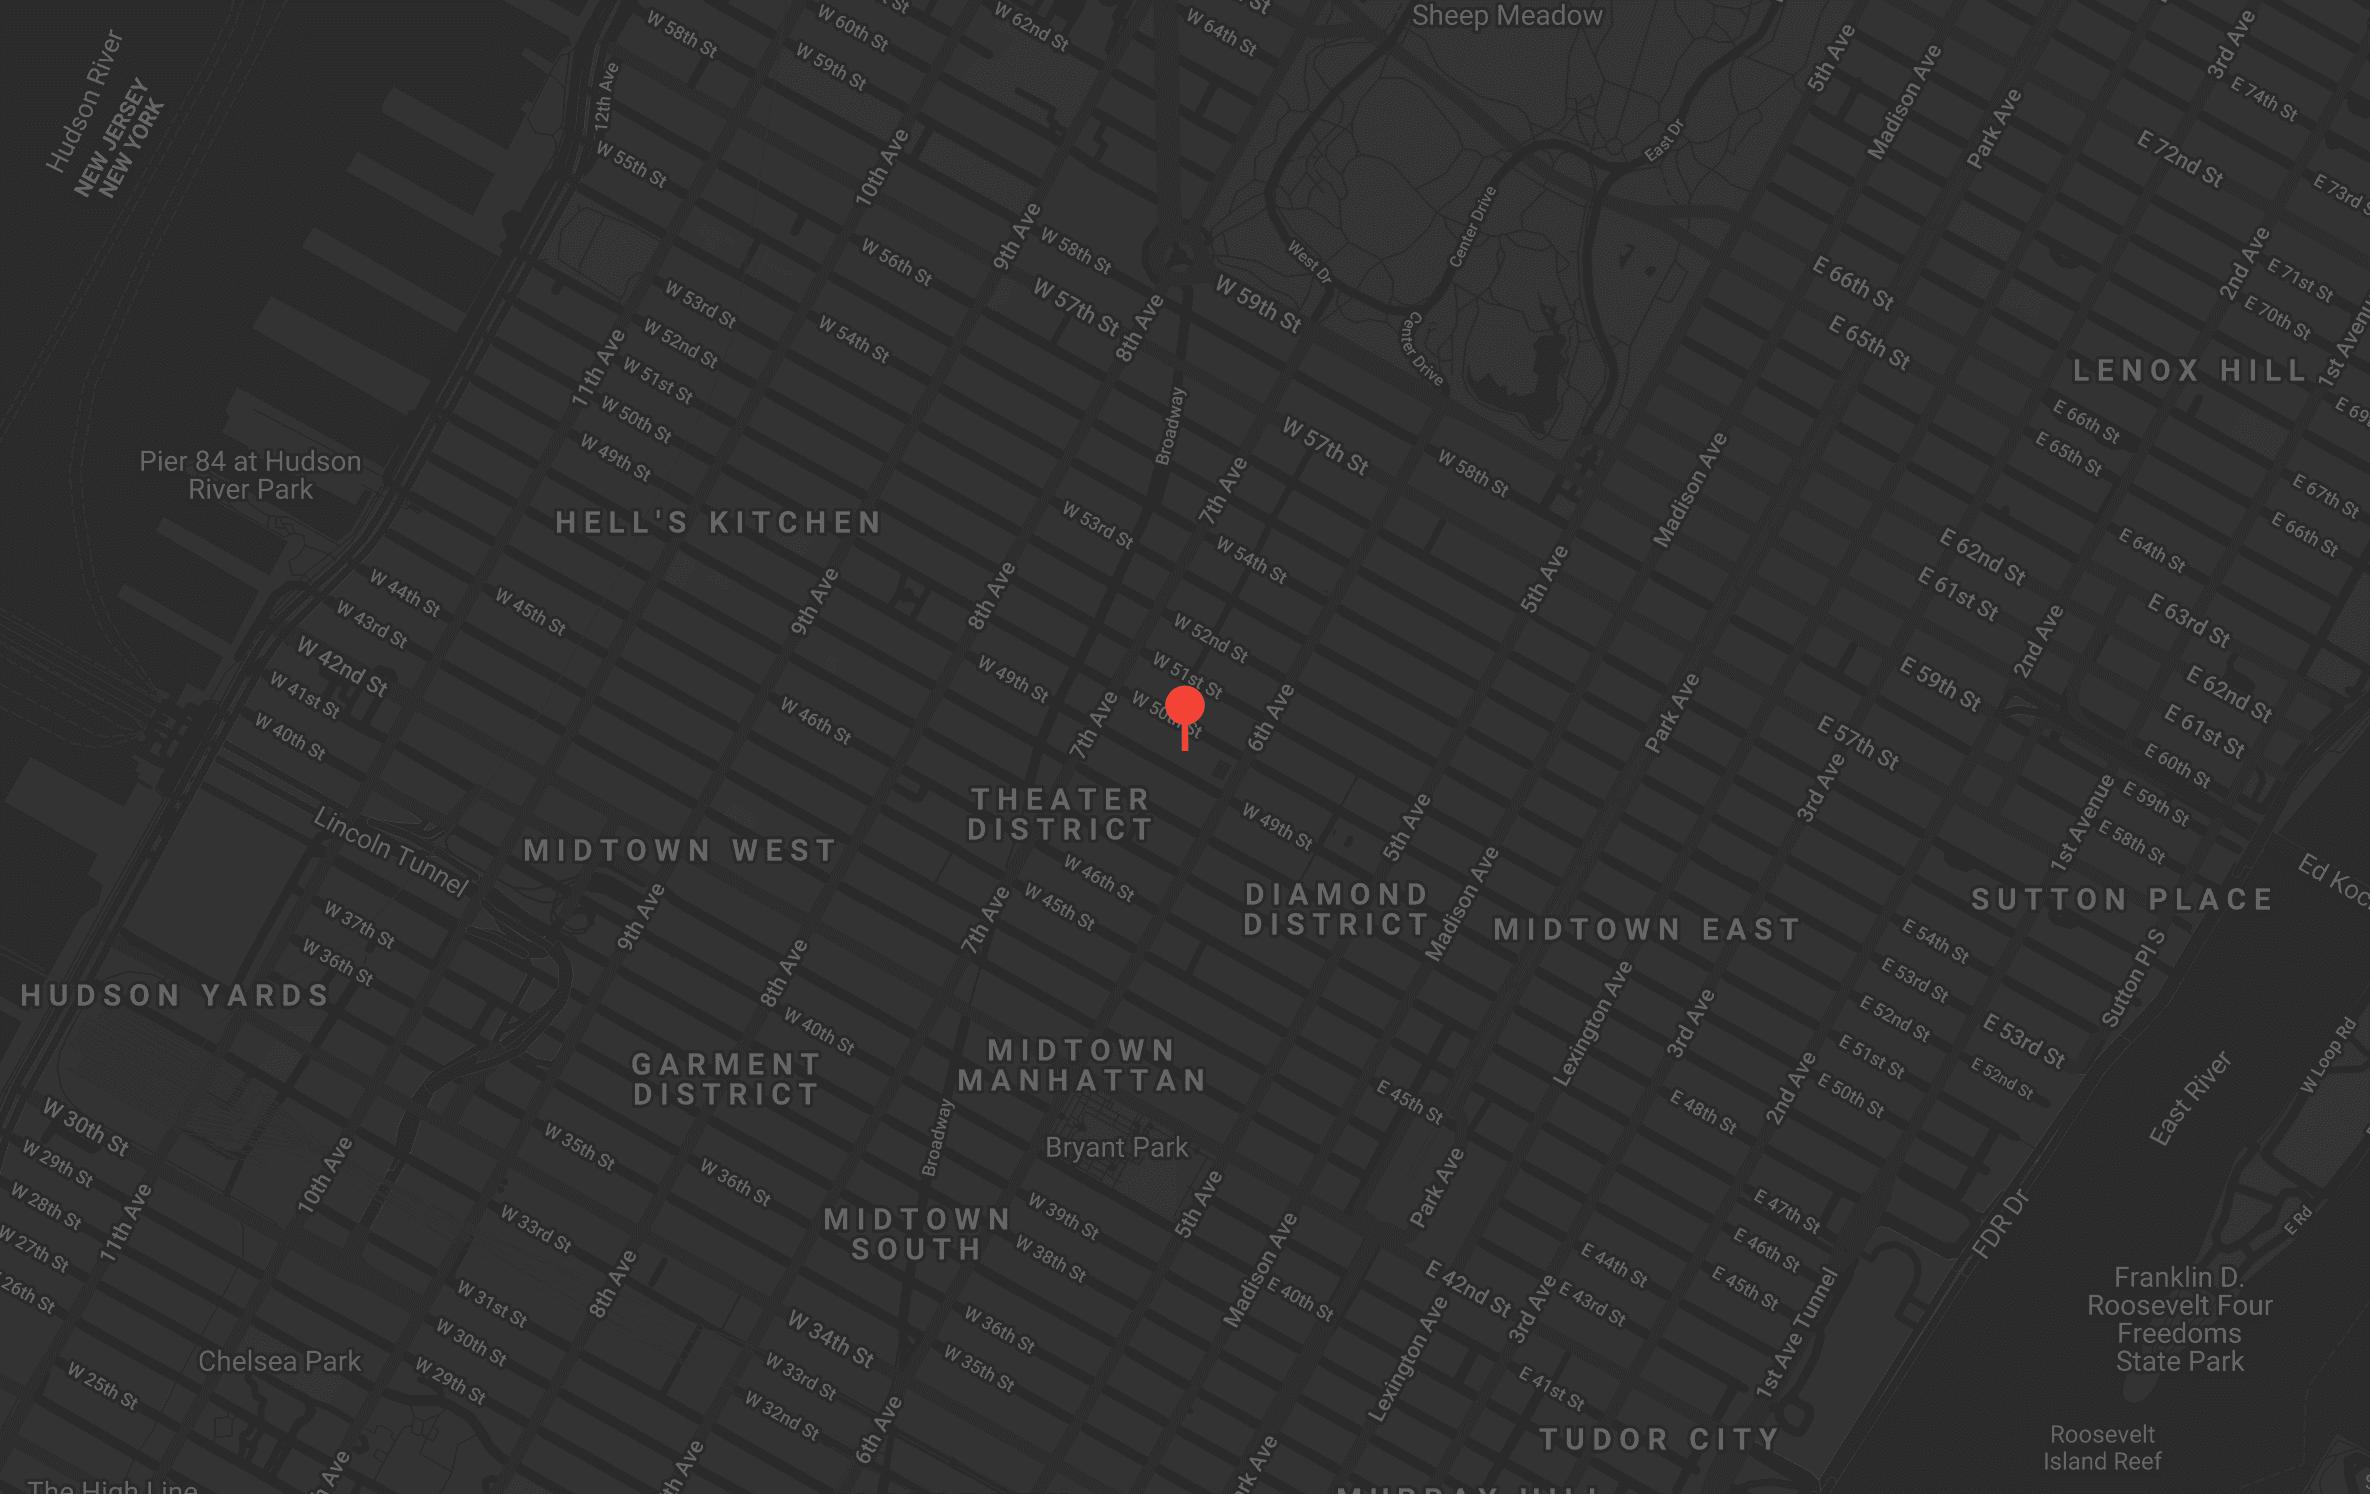 Map of Midtown Manhattan.